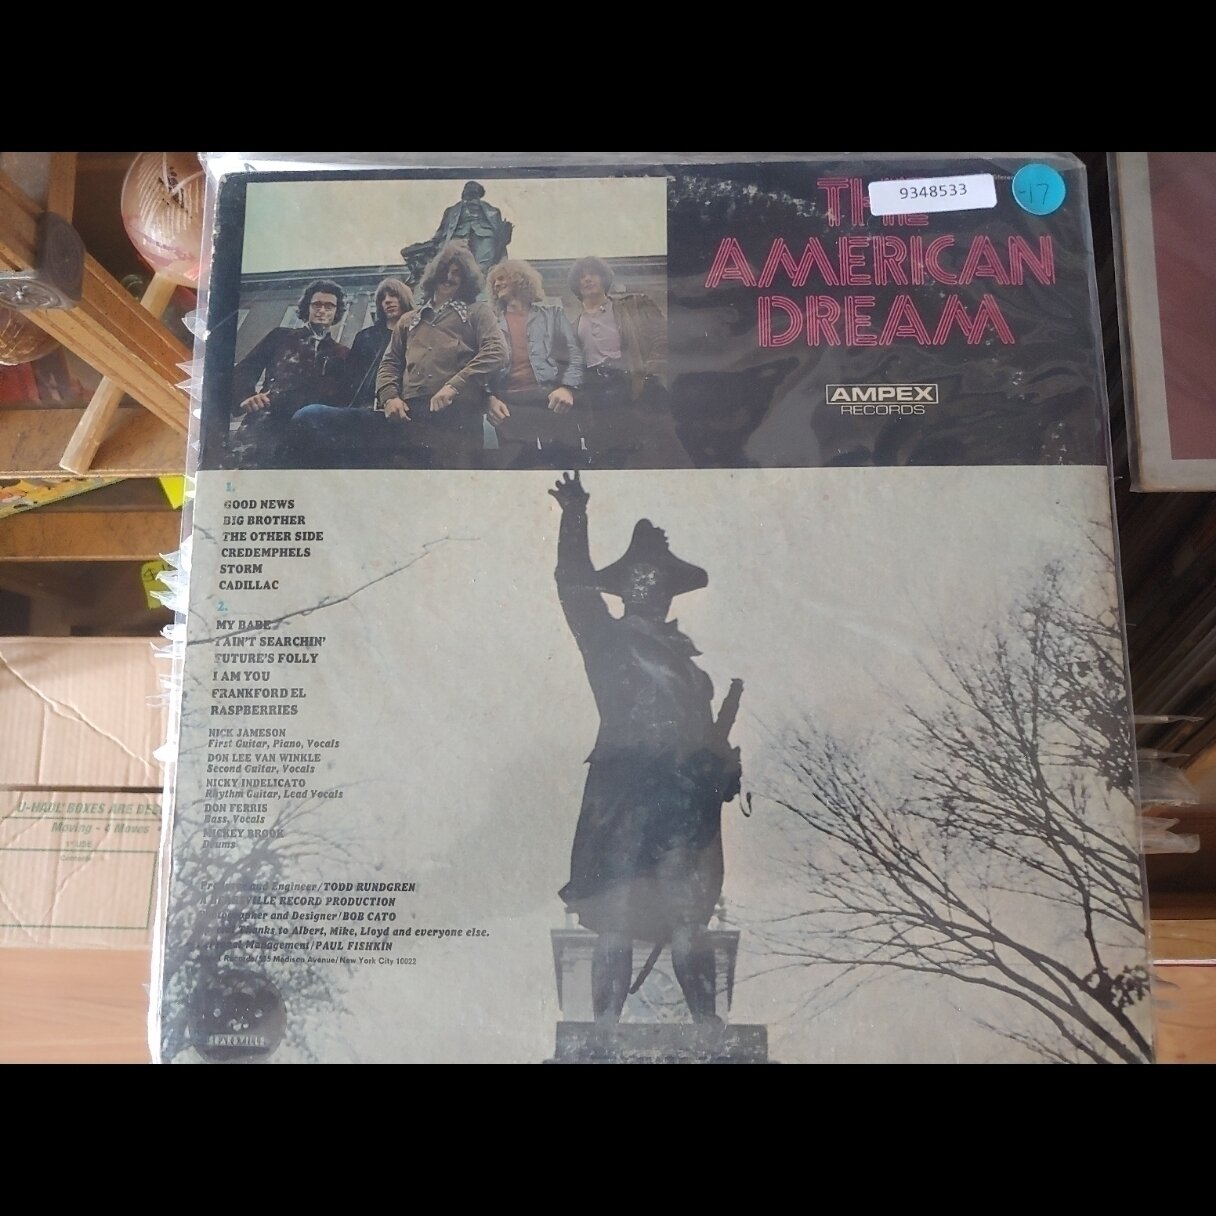 AMERICAN DREAM- AMERICAN DREAM